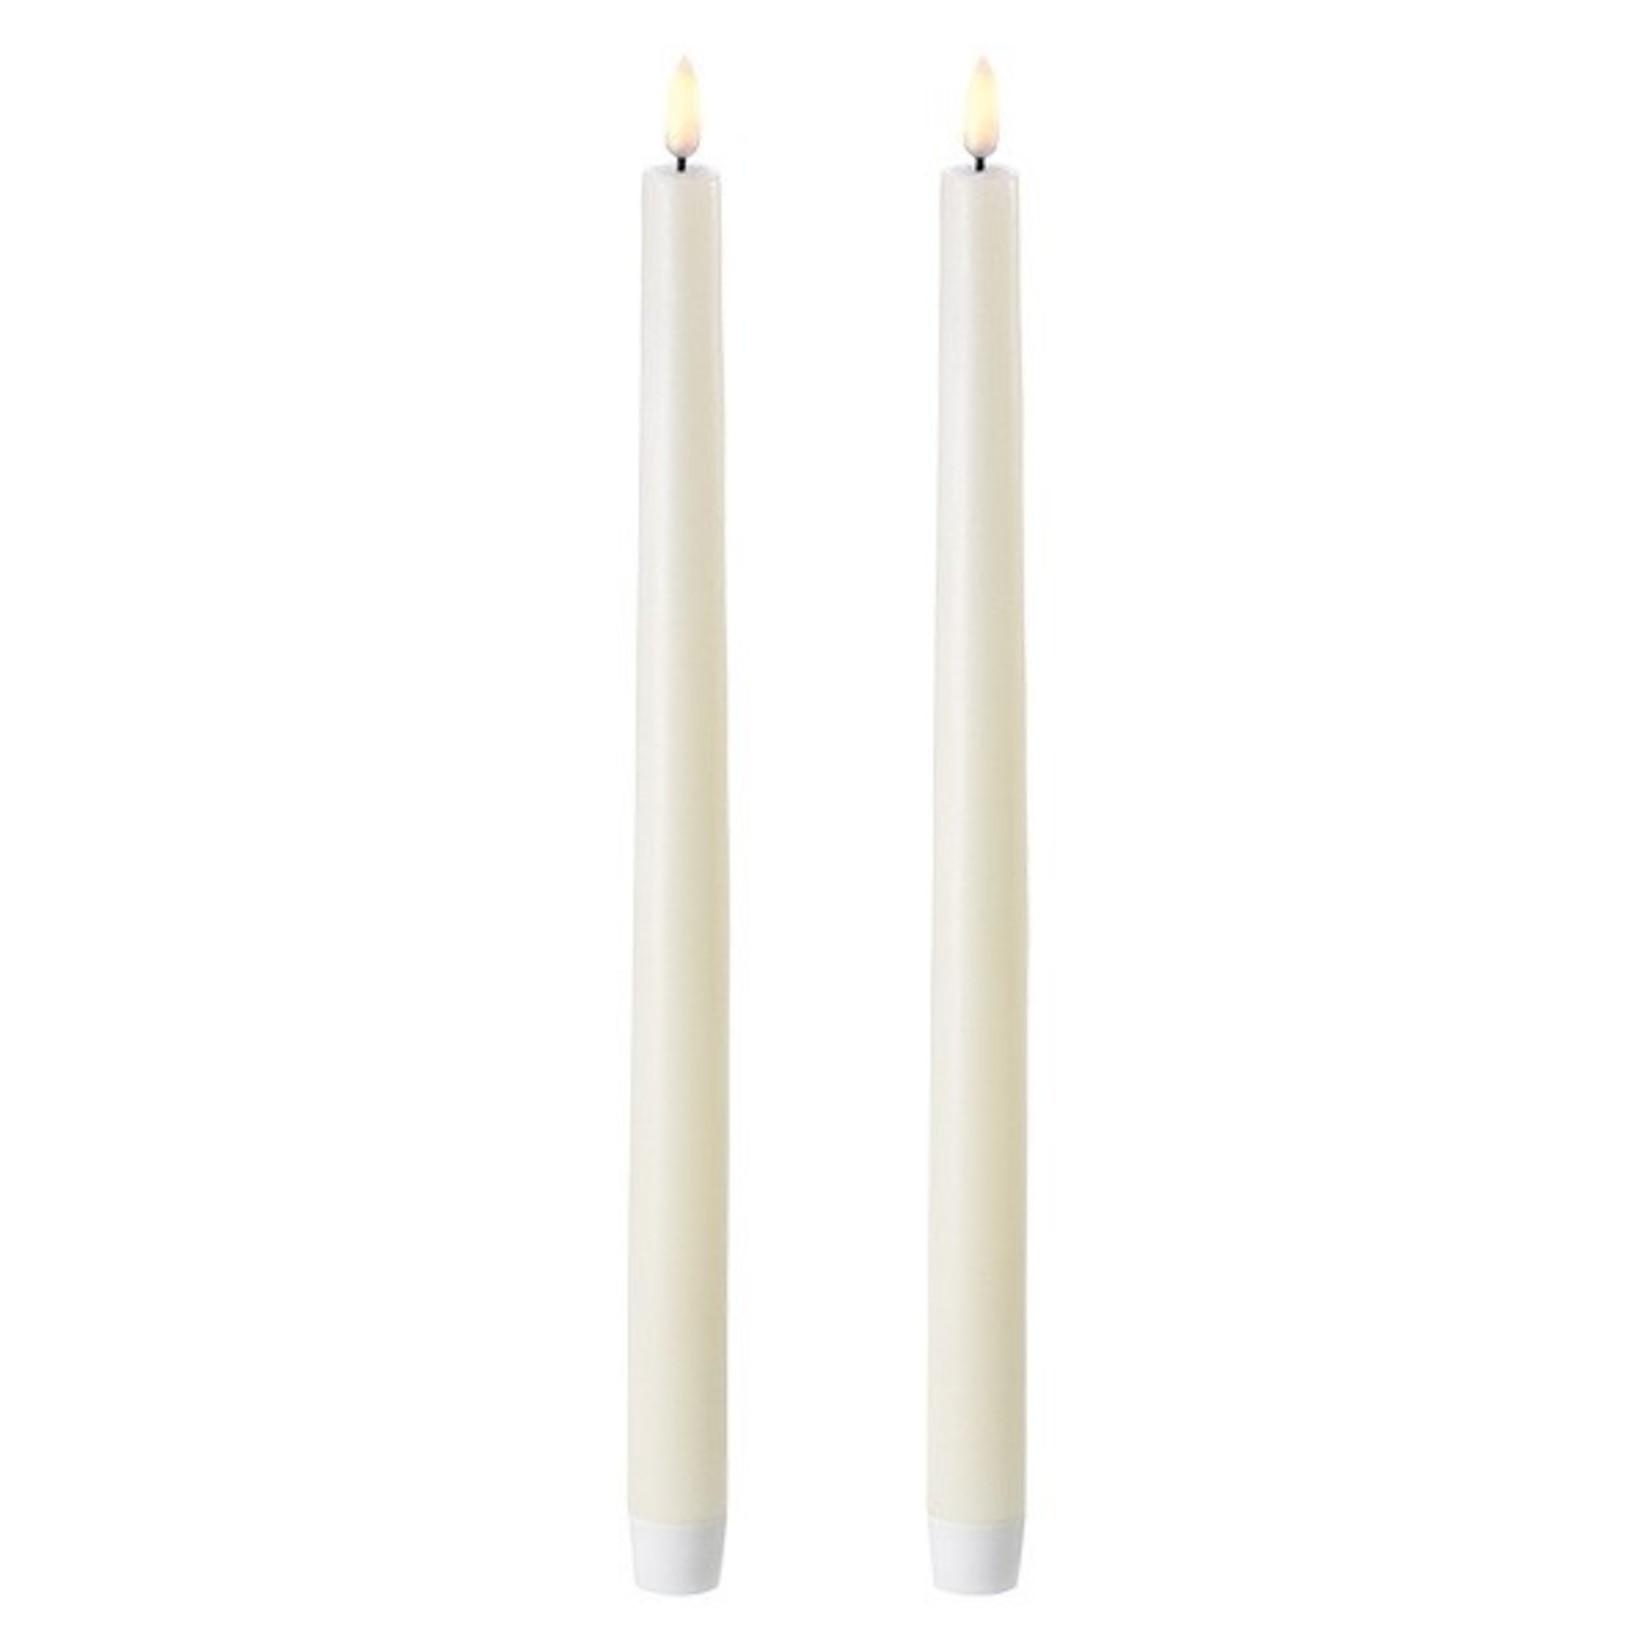 UYUNI LIGHTING LED TAPER CANDLE - 2PACK, w/switch - IVORY - Ø2,3 x 35 CM